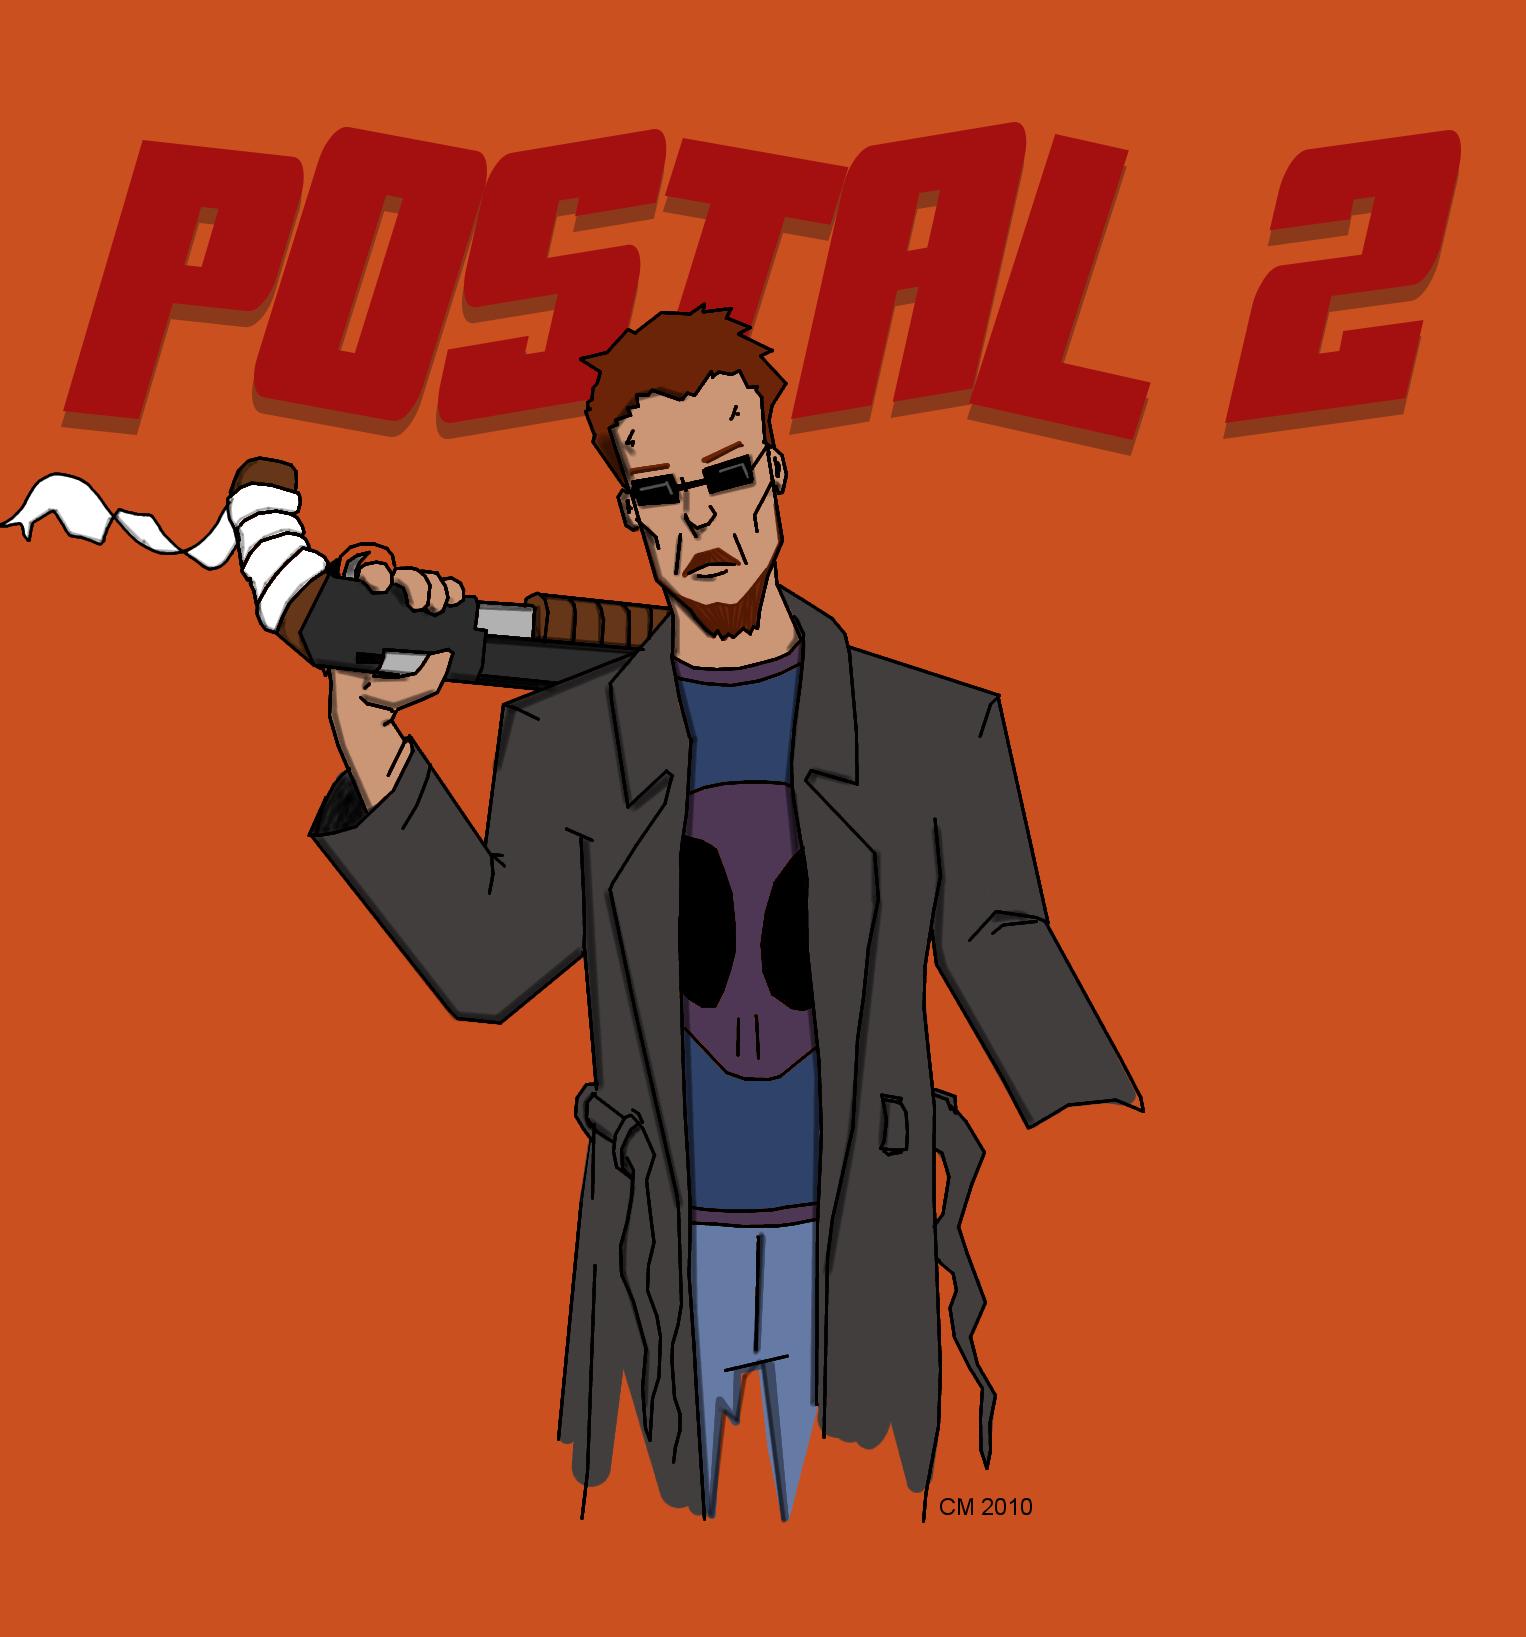 postal 2 dude art